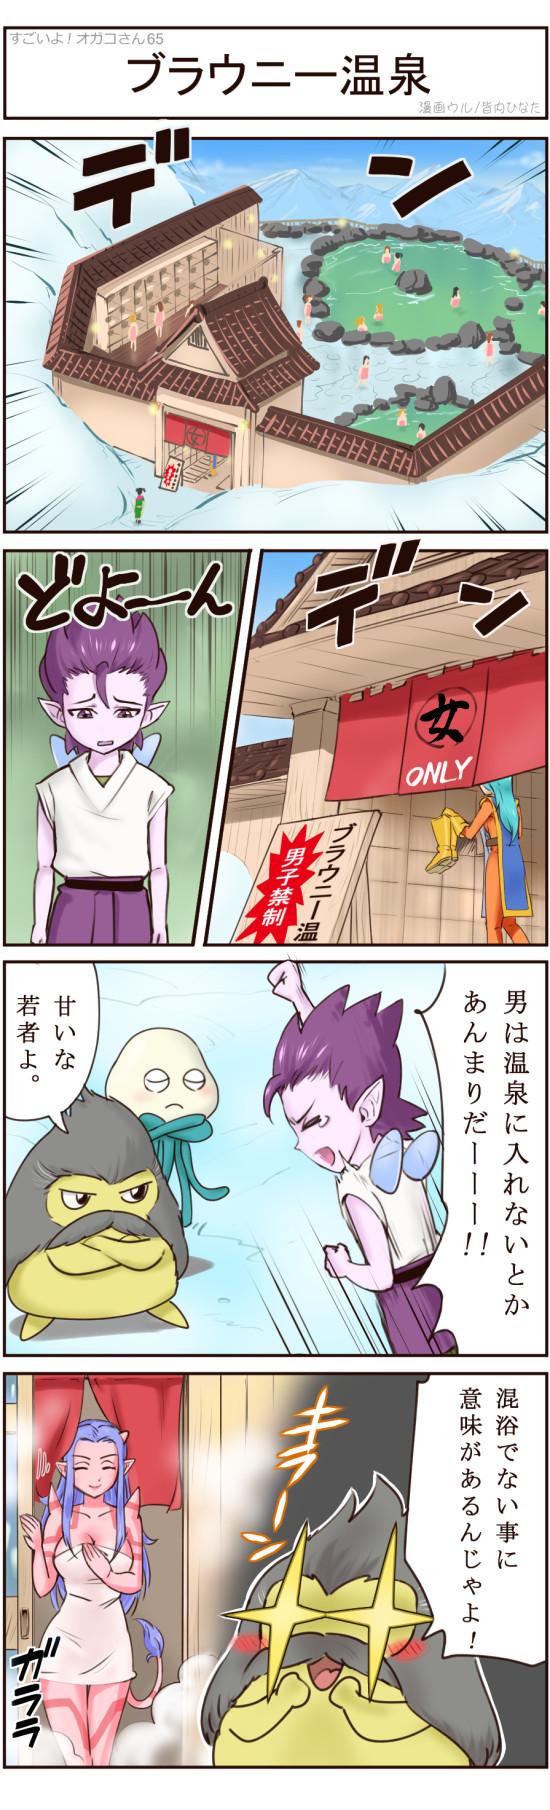 DQX4コマ漫画すごいよ!オガコさん第65話